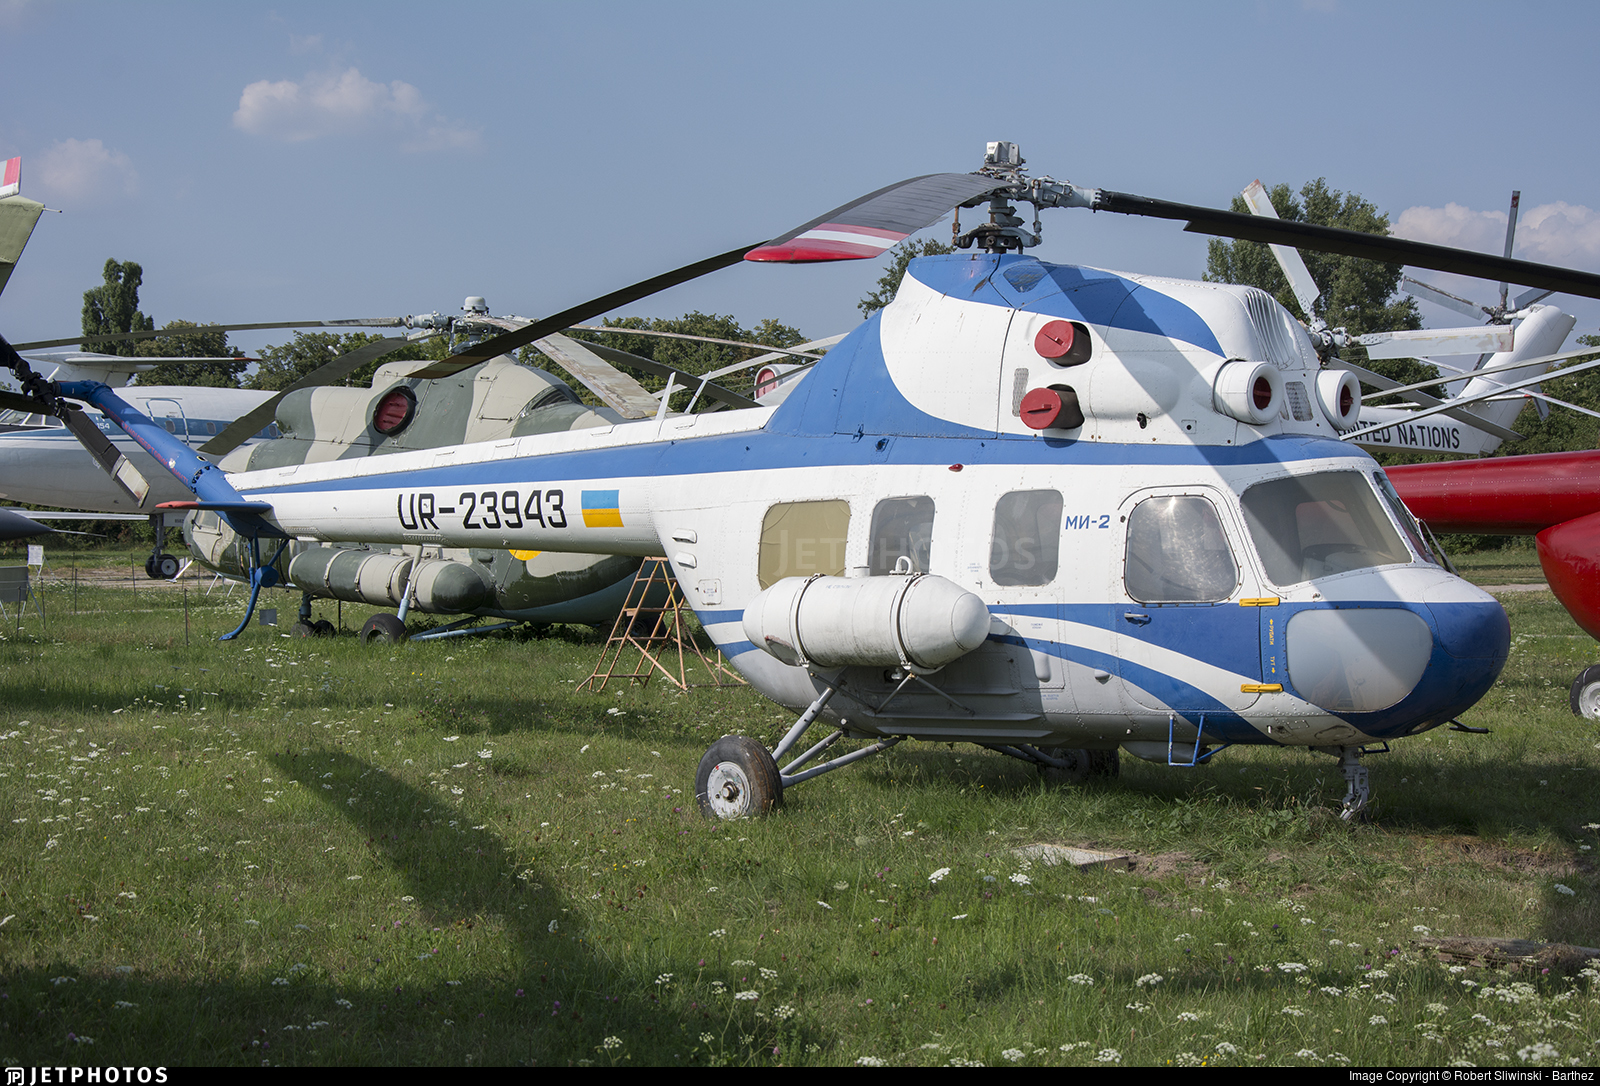 UR-23943 - PZL-Swidnik Mi-2 Hoplite - Ukrainian Aviation Museum